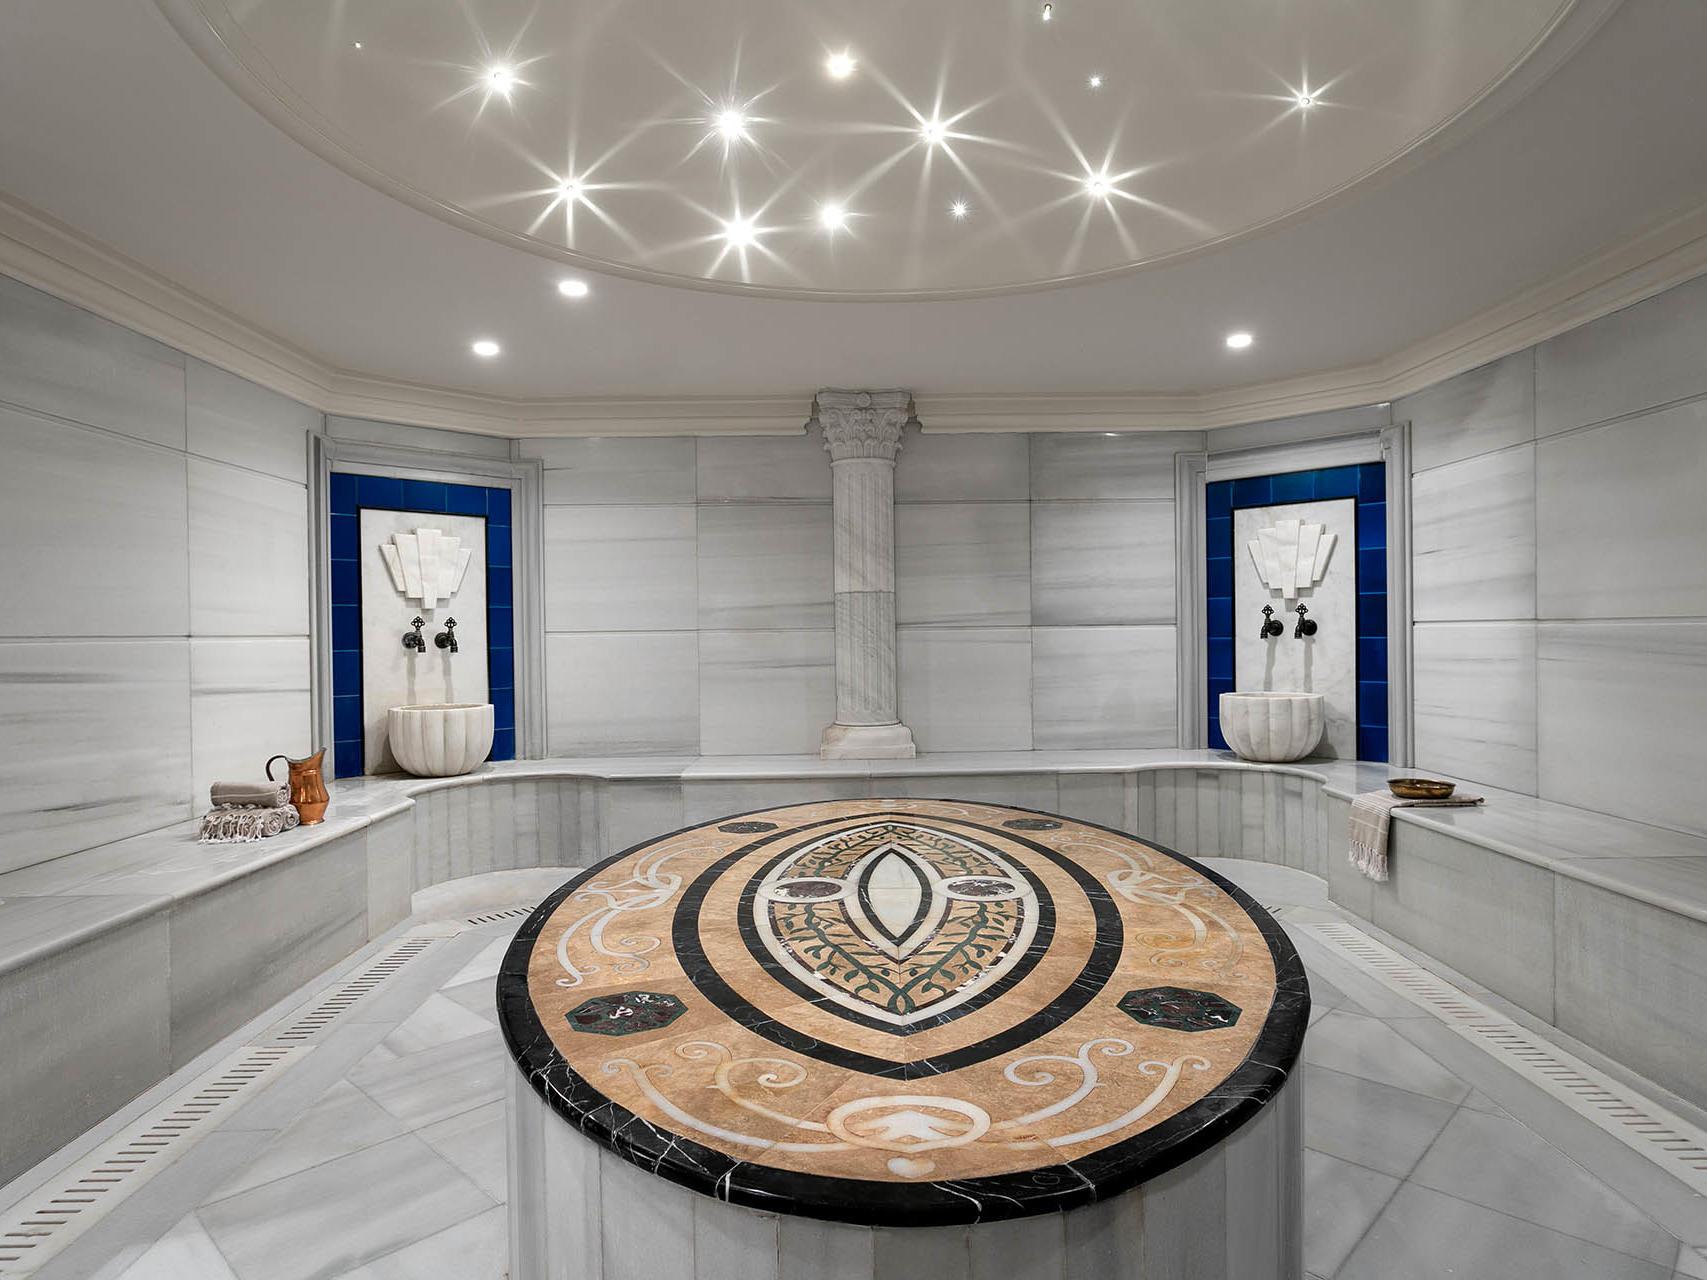 Mardanpalacehotel-Otel-Mermer-Dekorasyon- (10)